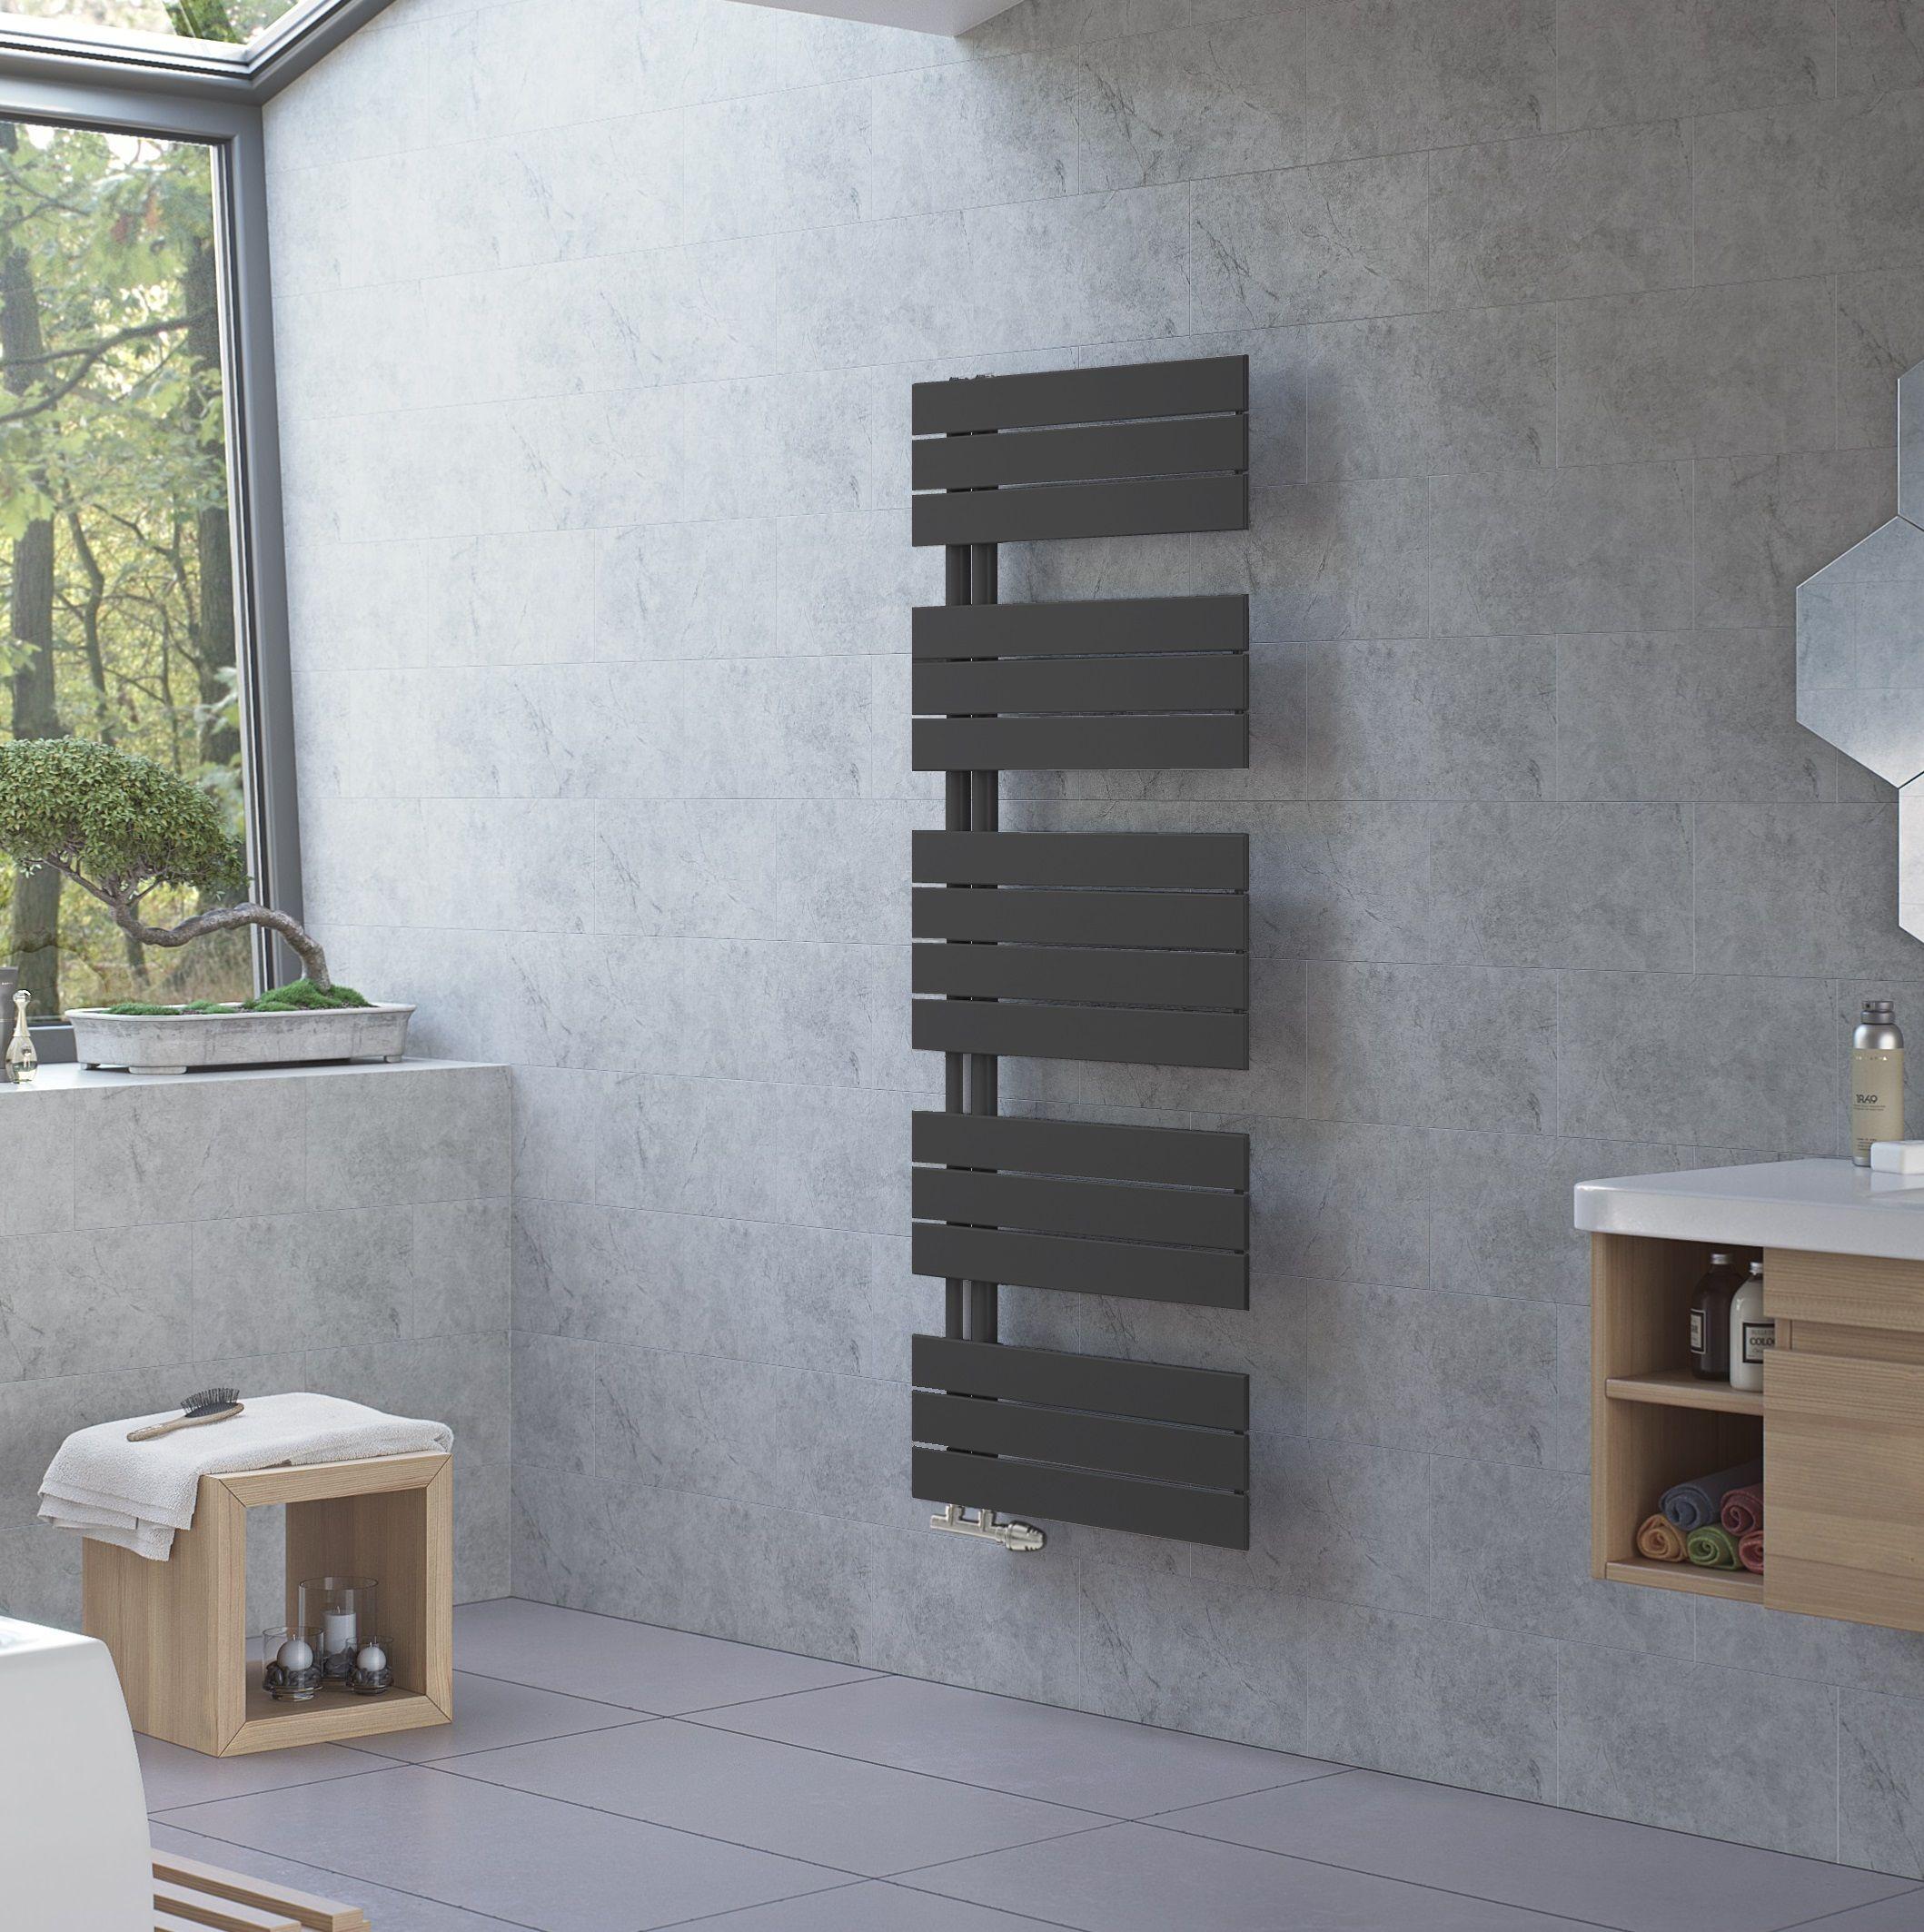 Full Size of Ximabadheizkrper P2 Open In 2020 Heizkrper Bad Elektroheizkörper Heizkörper Wohnzimmer Badezimmer Für Bauhaus Fenster Wohnzimmer Heizkörper Bauhaus